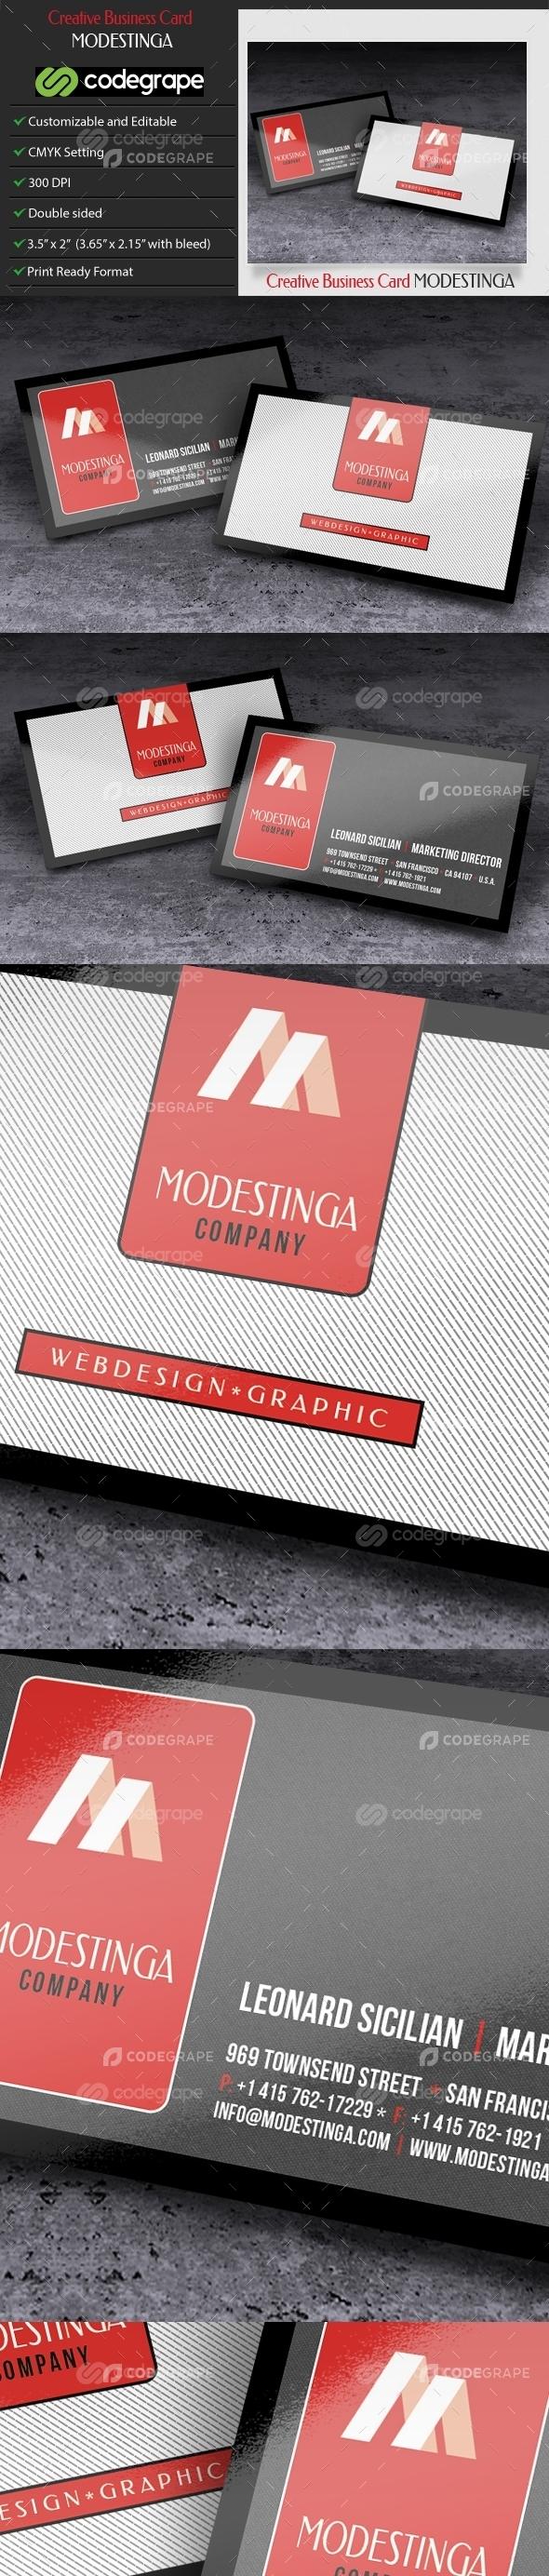 Creative or Corporate Business Card - Modestinga